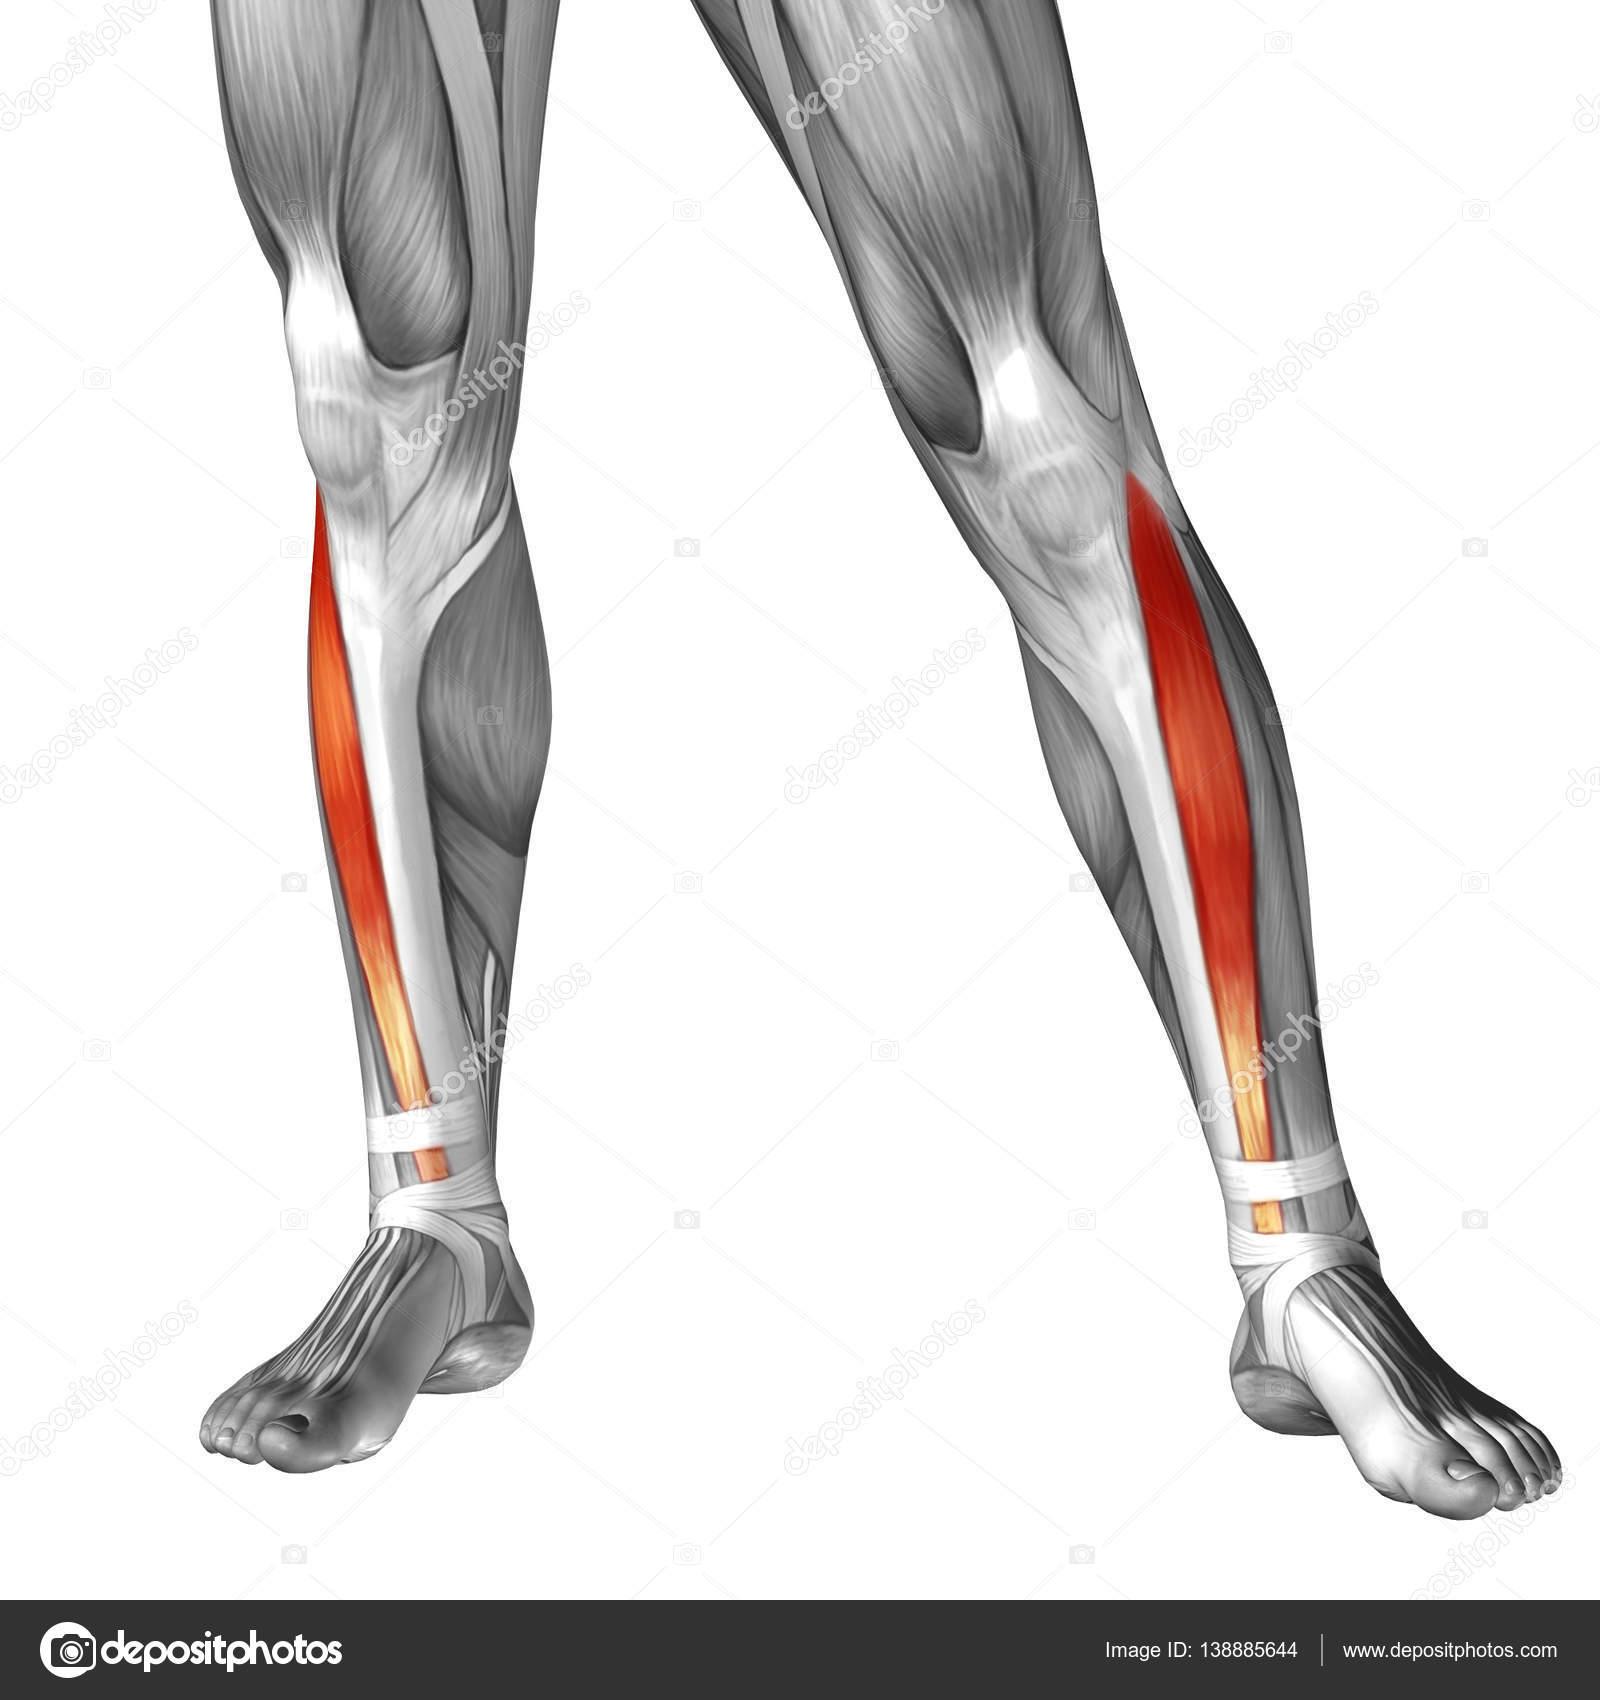 human lower leg anatomy — Stock Photo © design36 #138885644